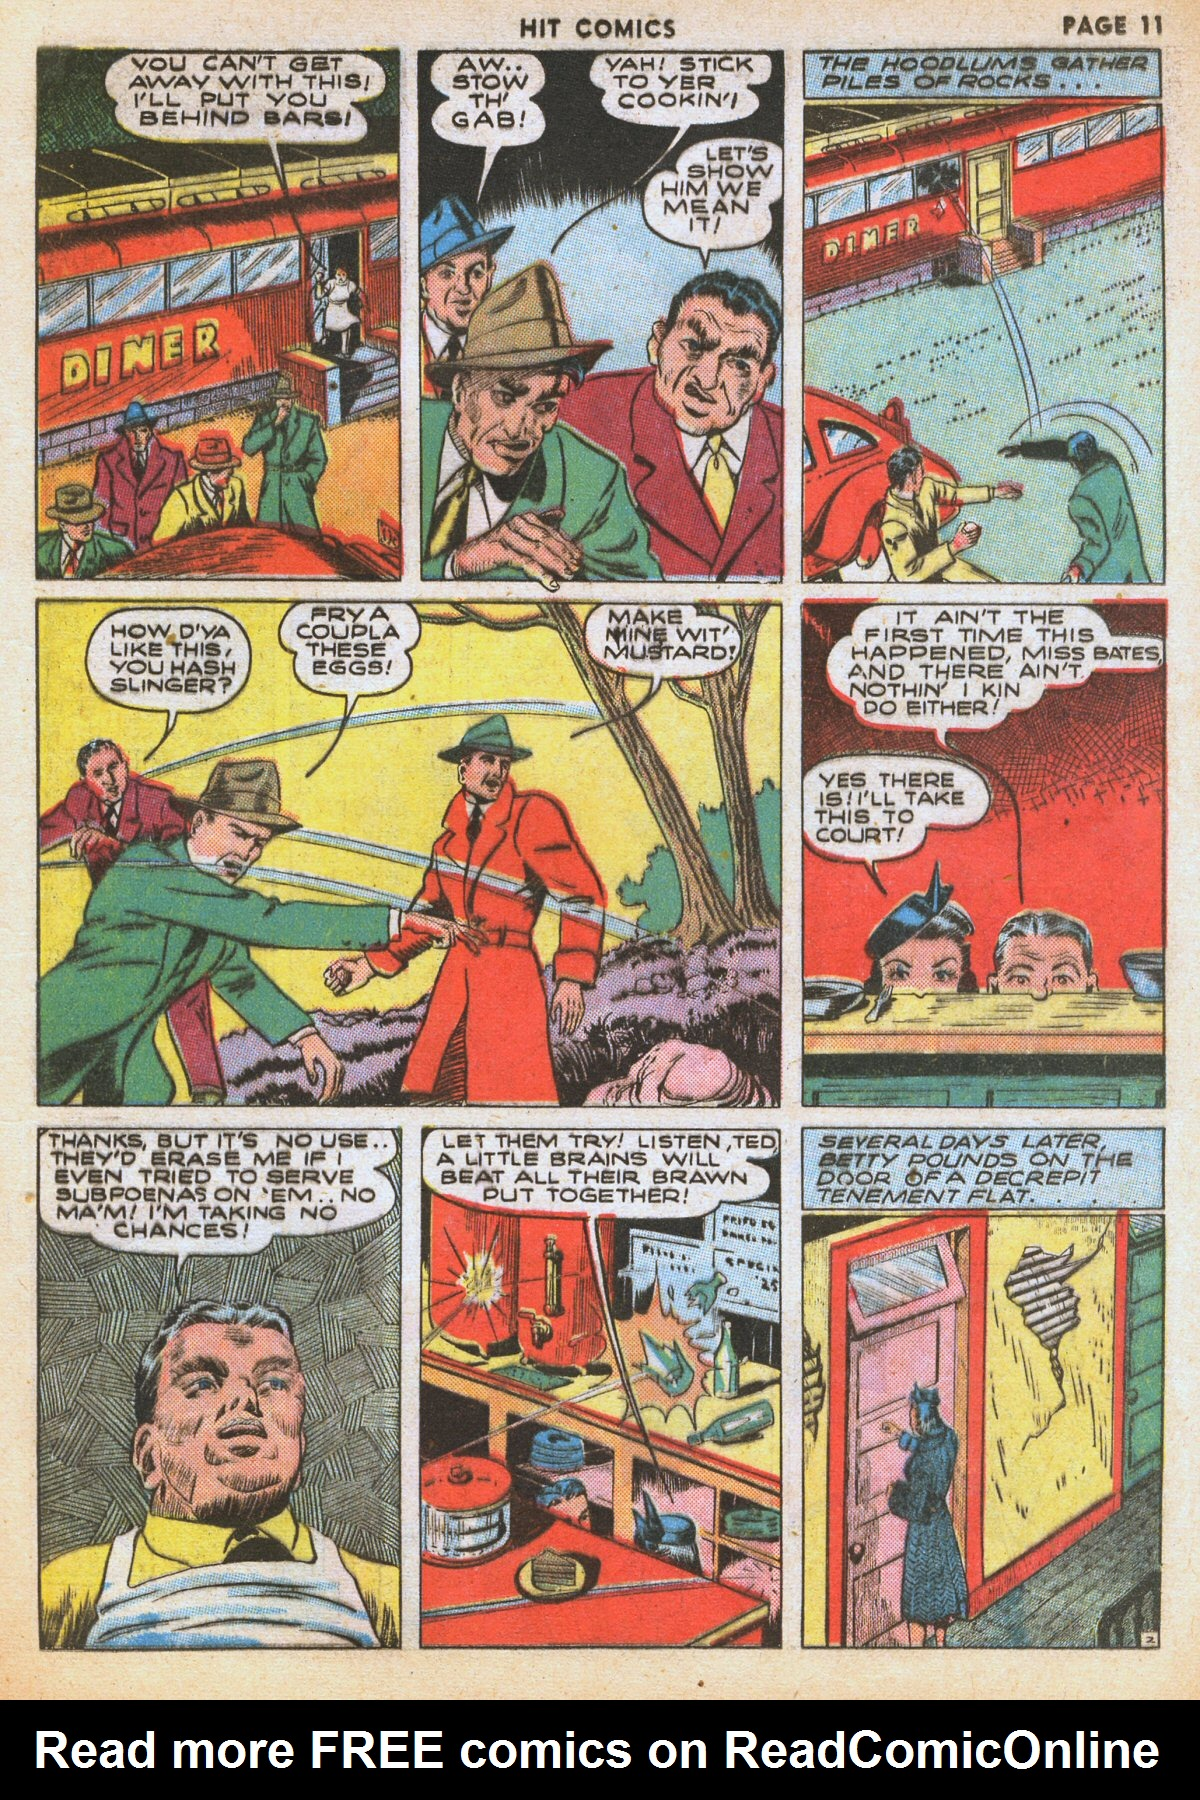 Read online Hit Comics comic -  Issue #12 - 13